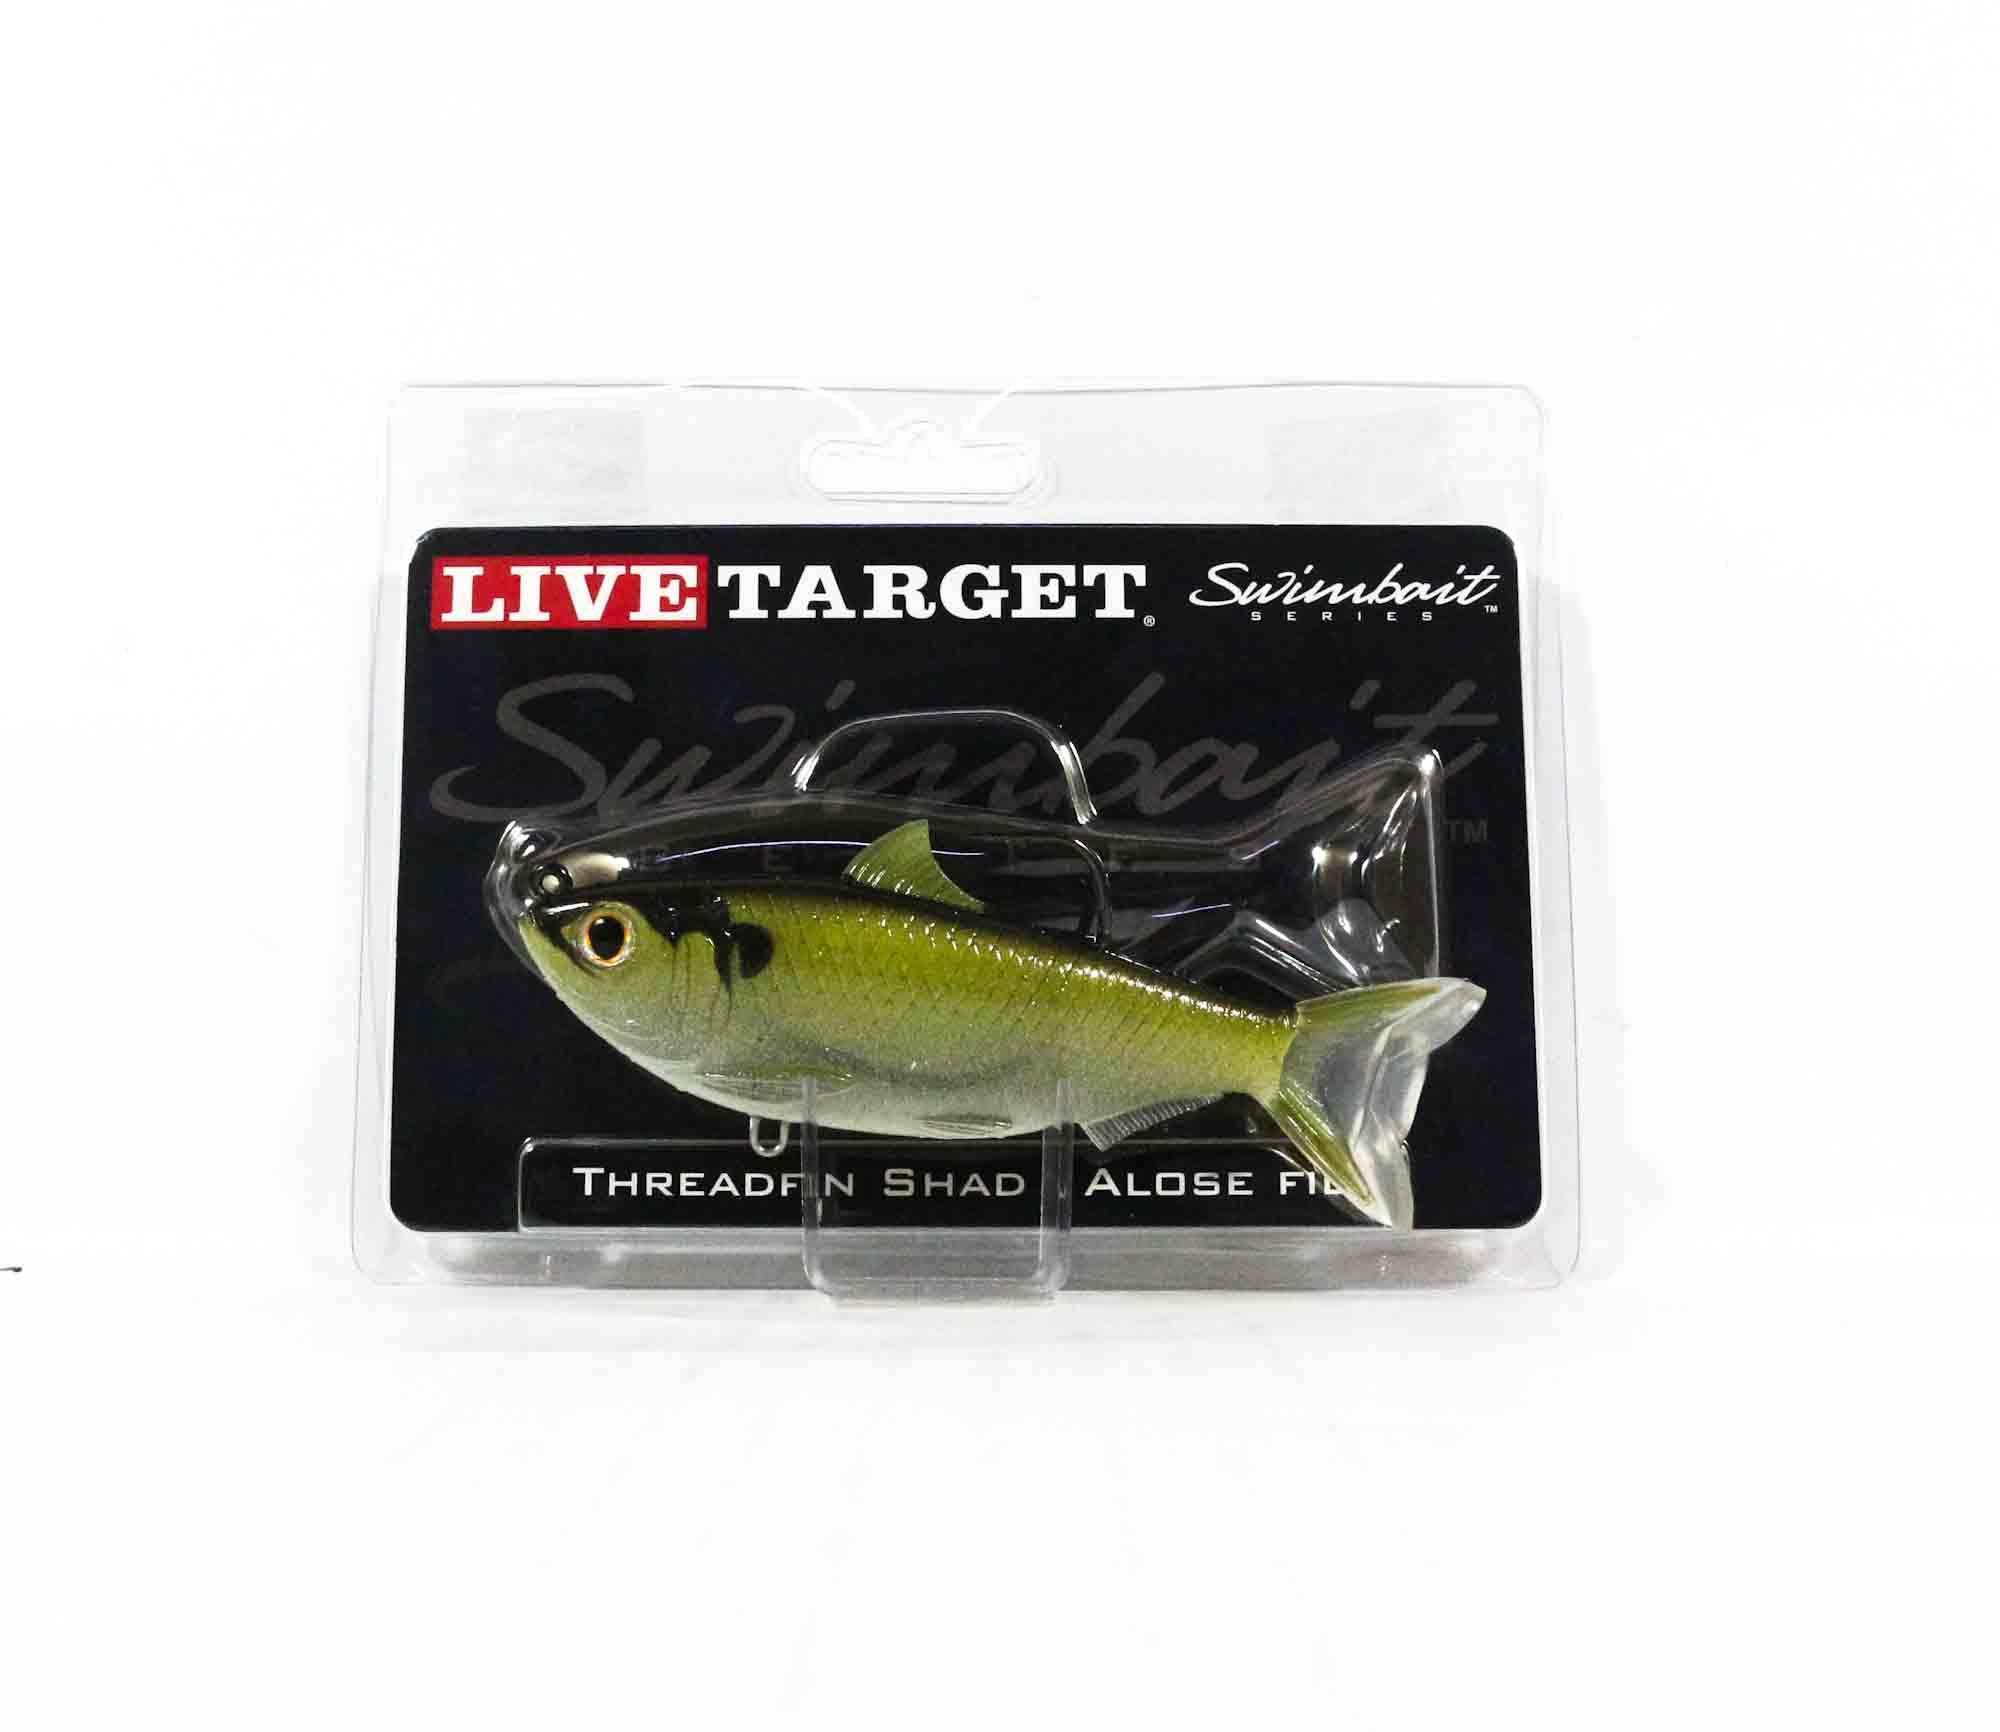 Live Target TFS115MS703 Swimbait Threadfin Shad 4.5 Inch Green Bronze (9471)